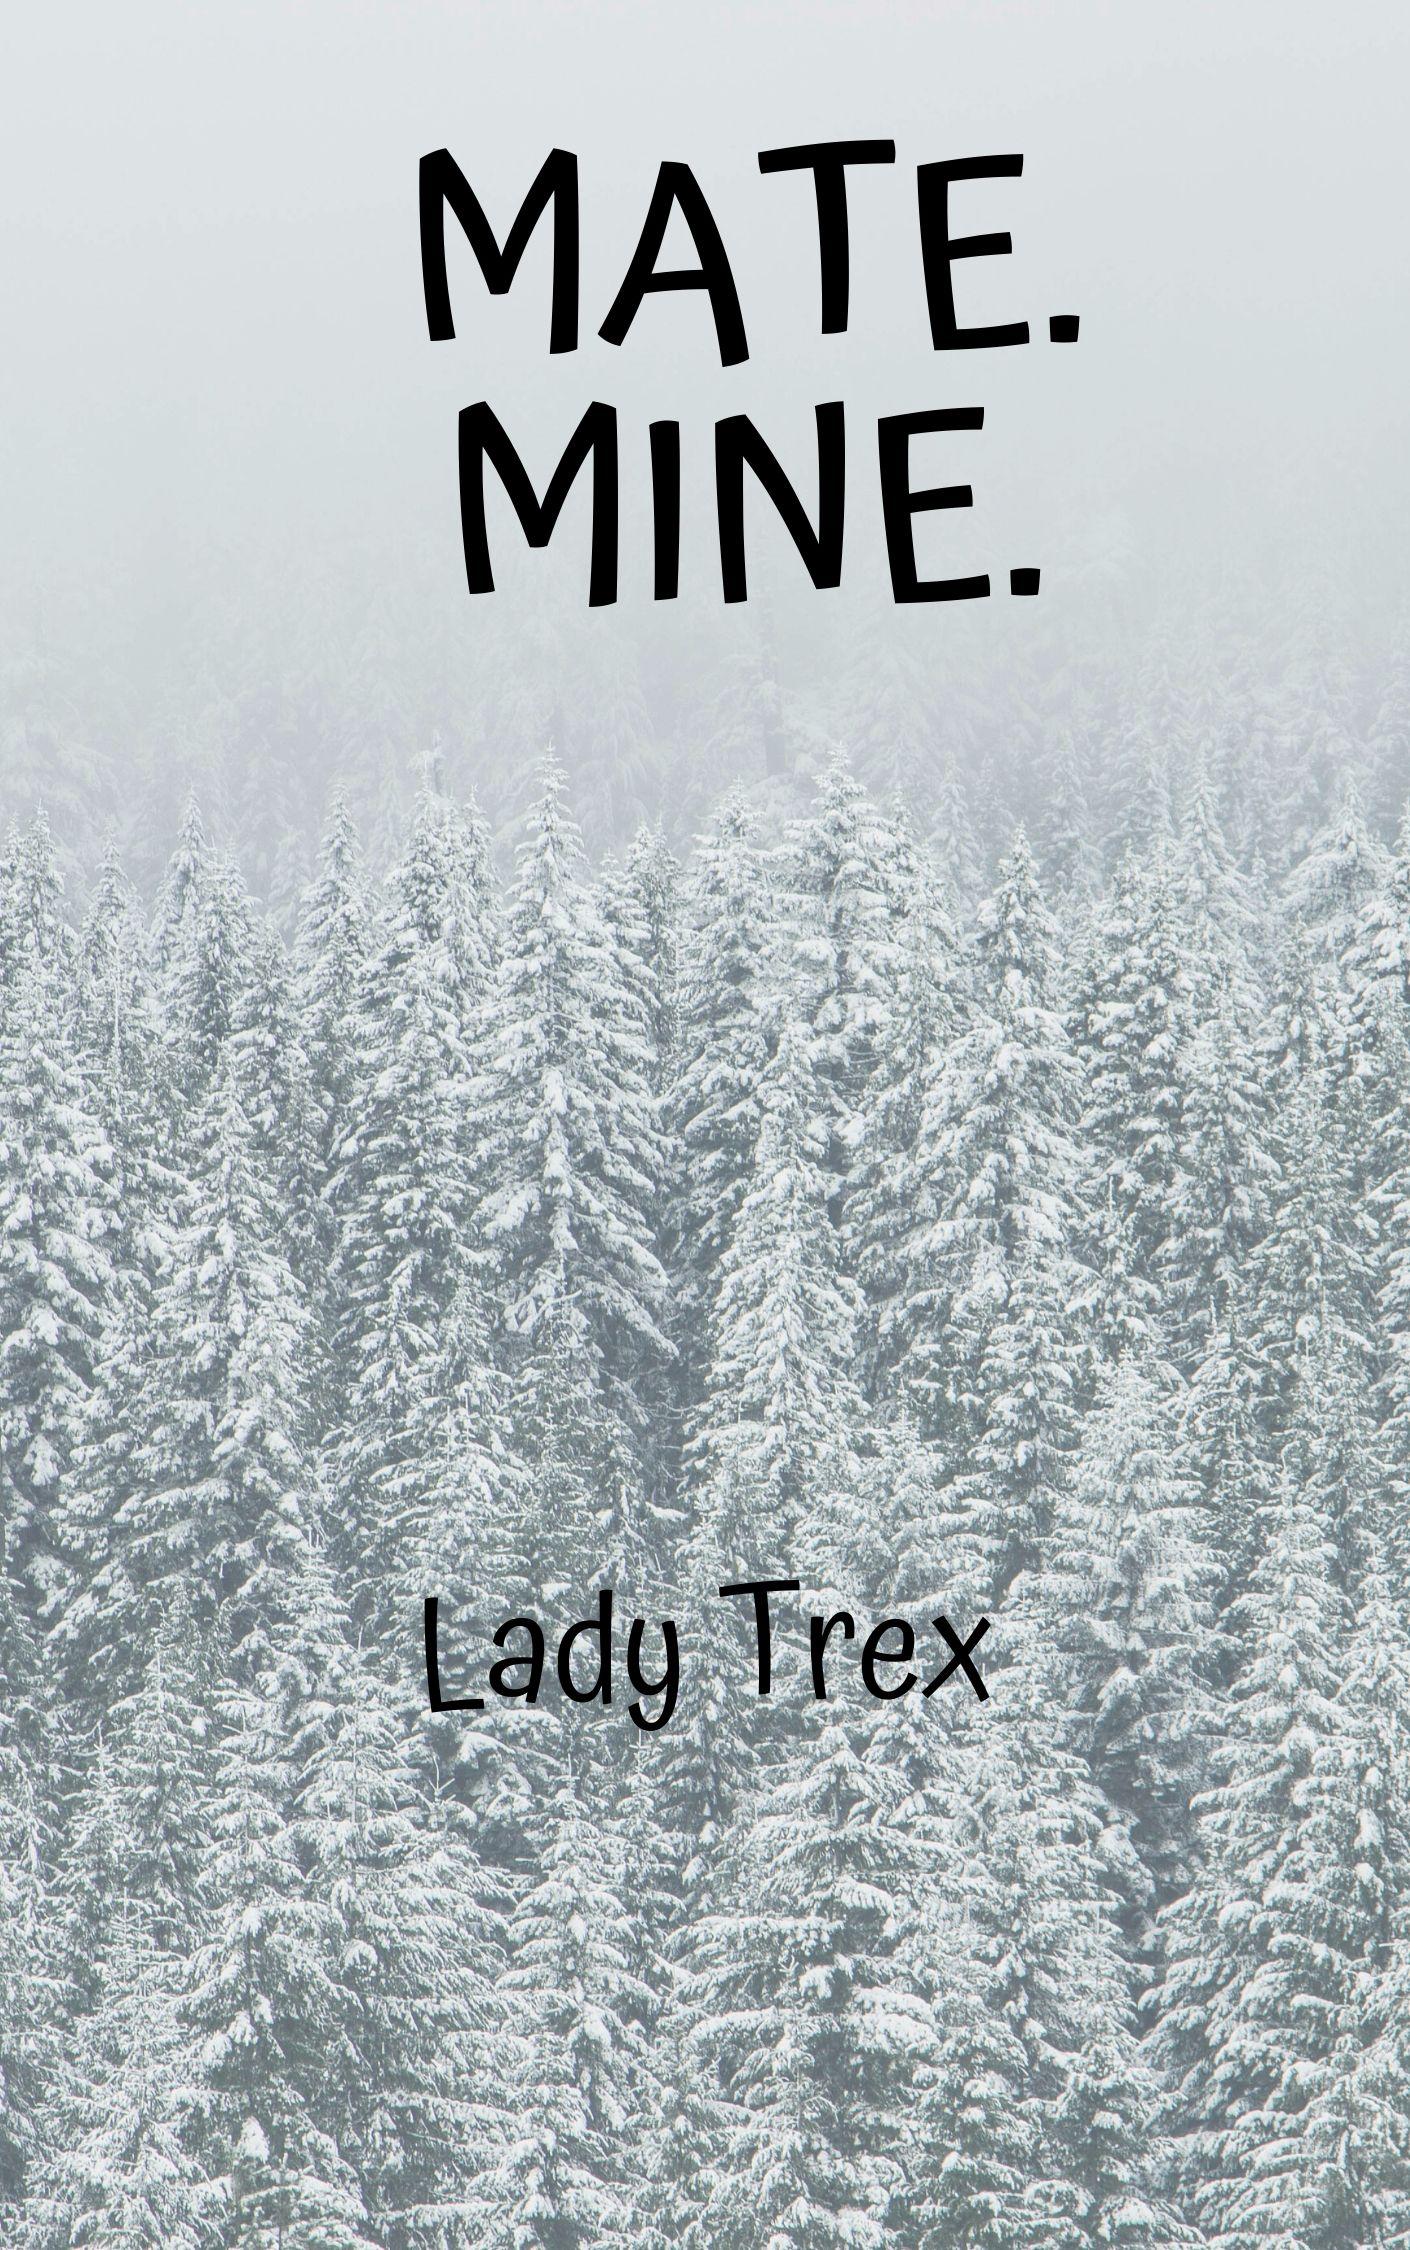 Mate. Mine.